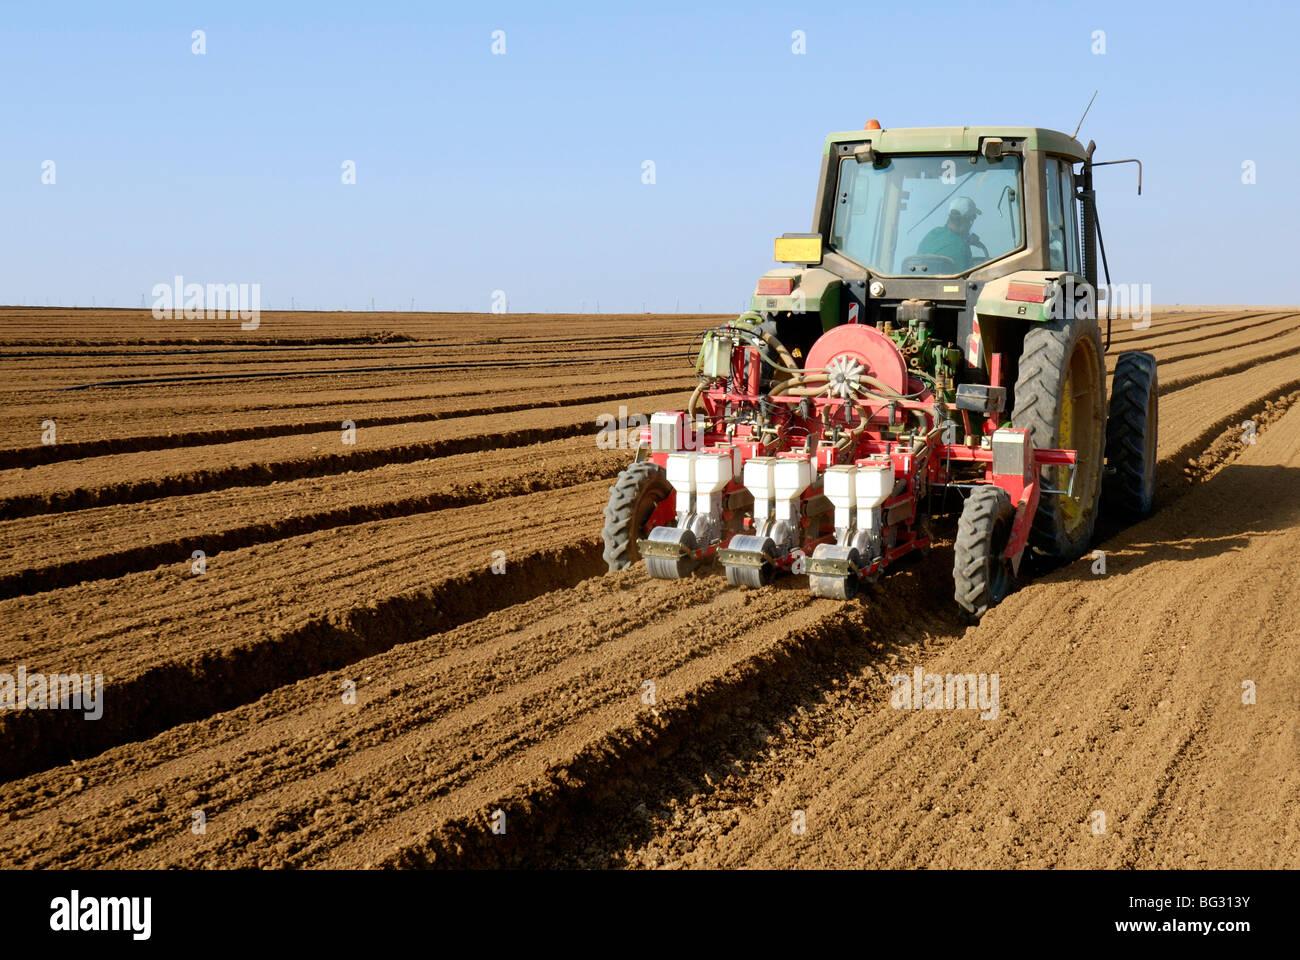 Israel, Negev Desert, Tractor plants seeds in a field Stock